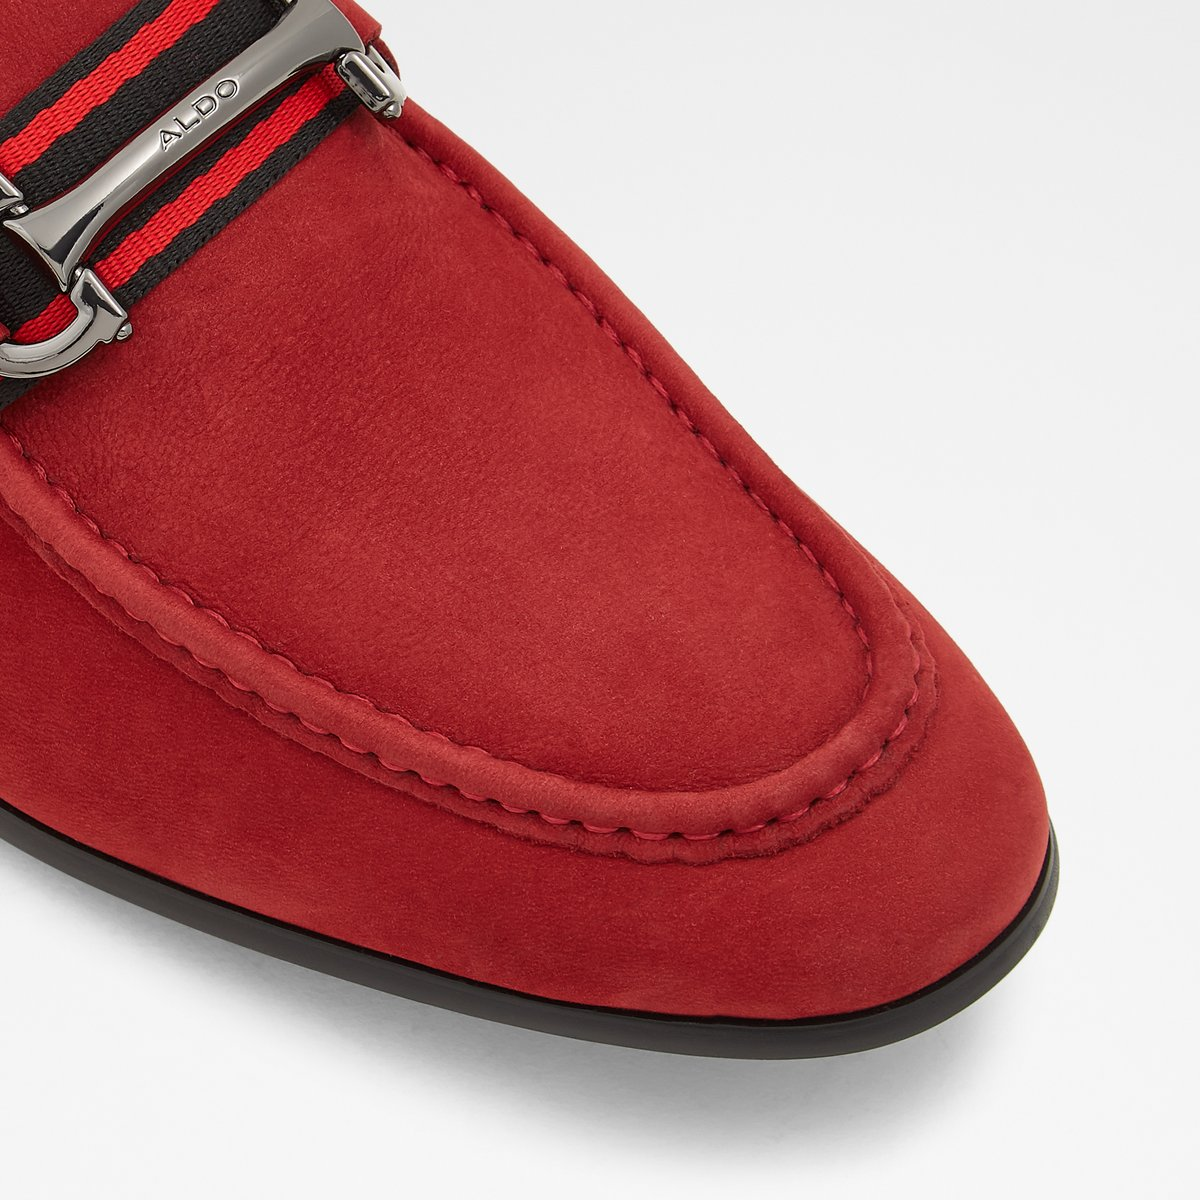 Daywen Red Men's Loafers   ALDO US